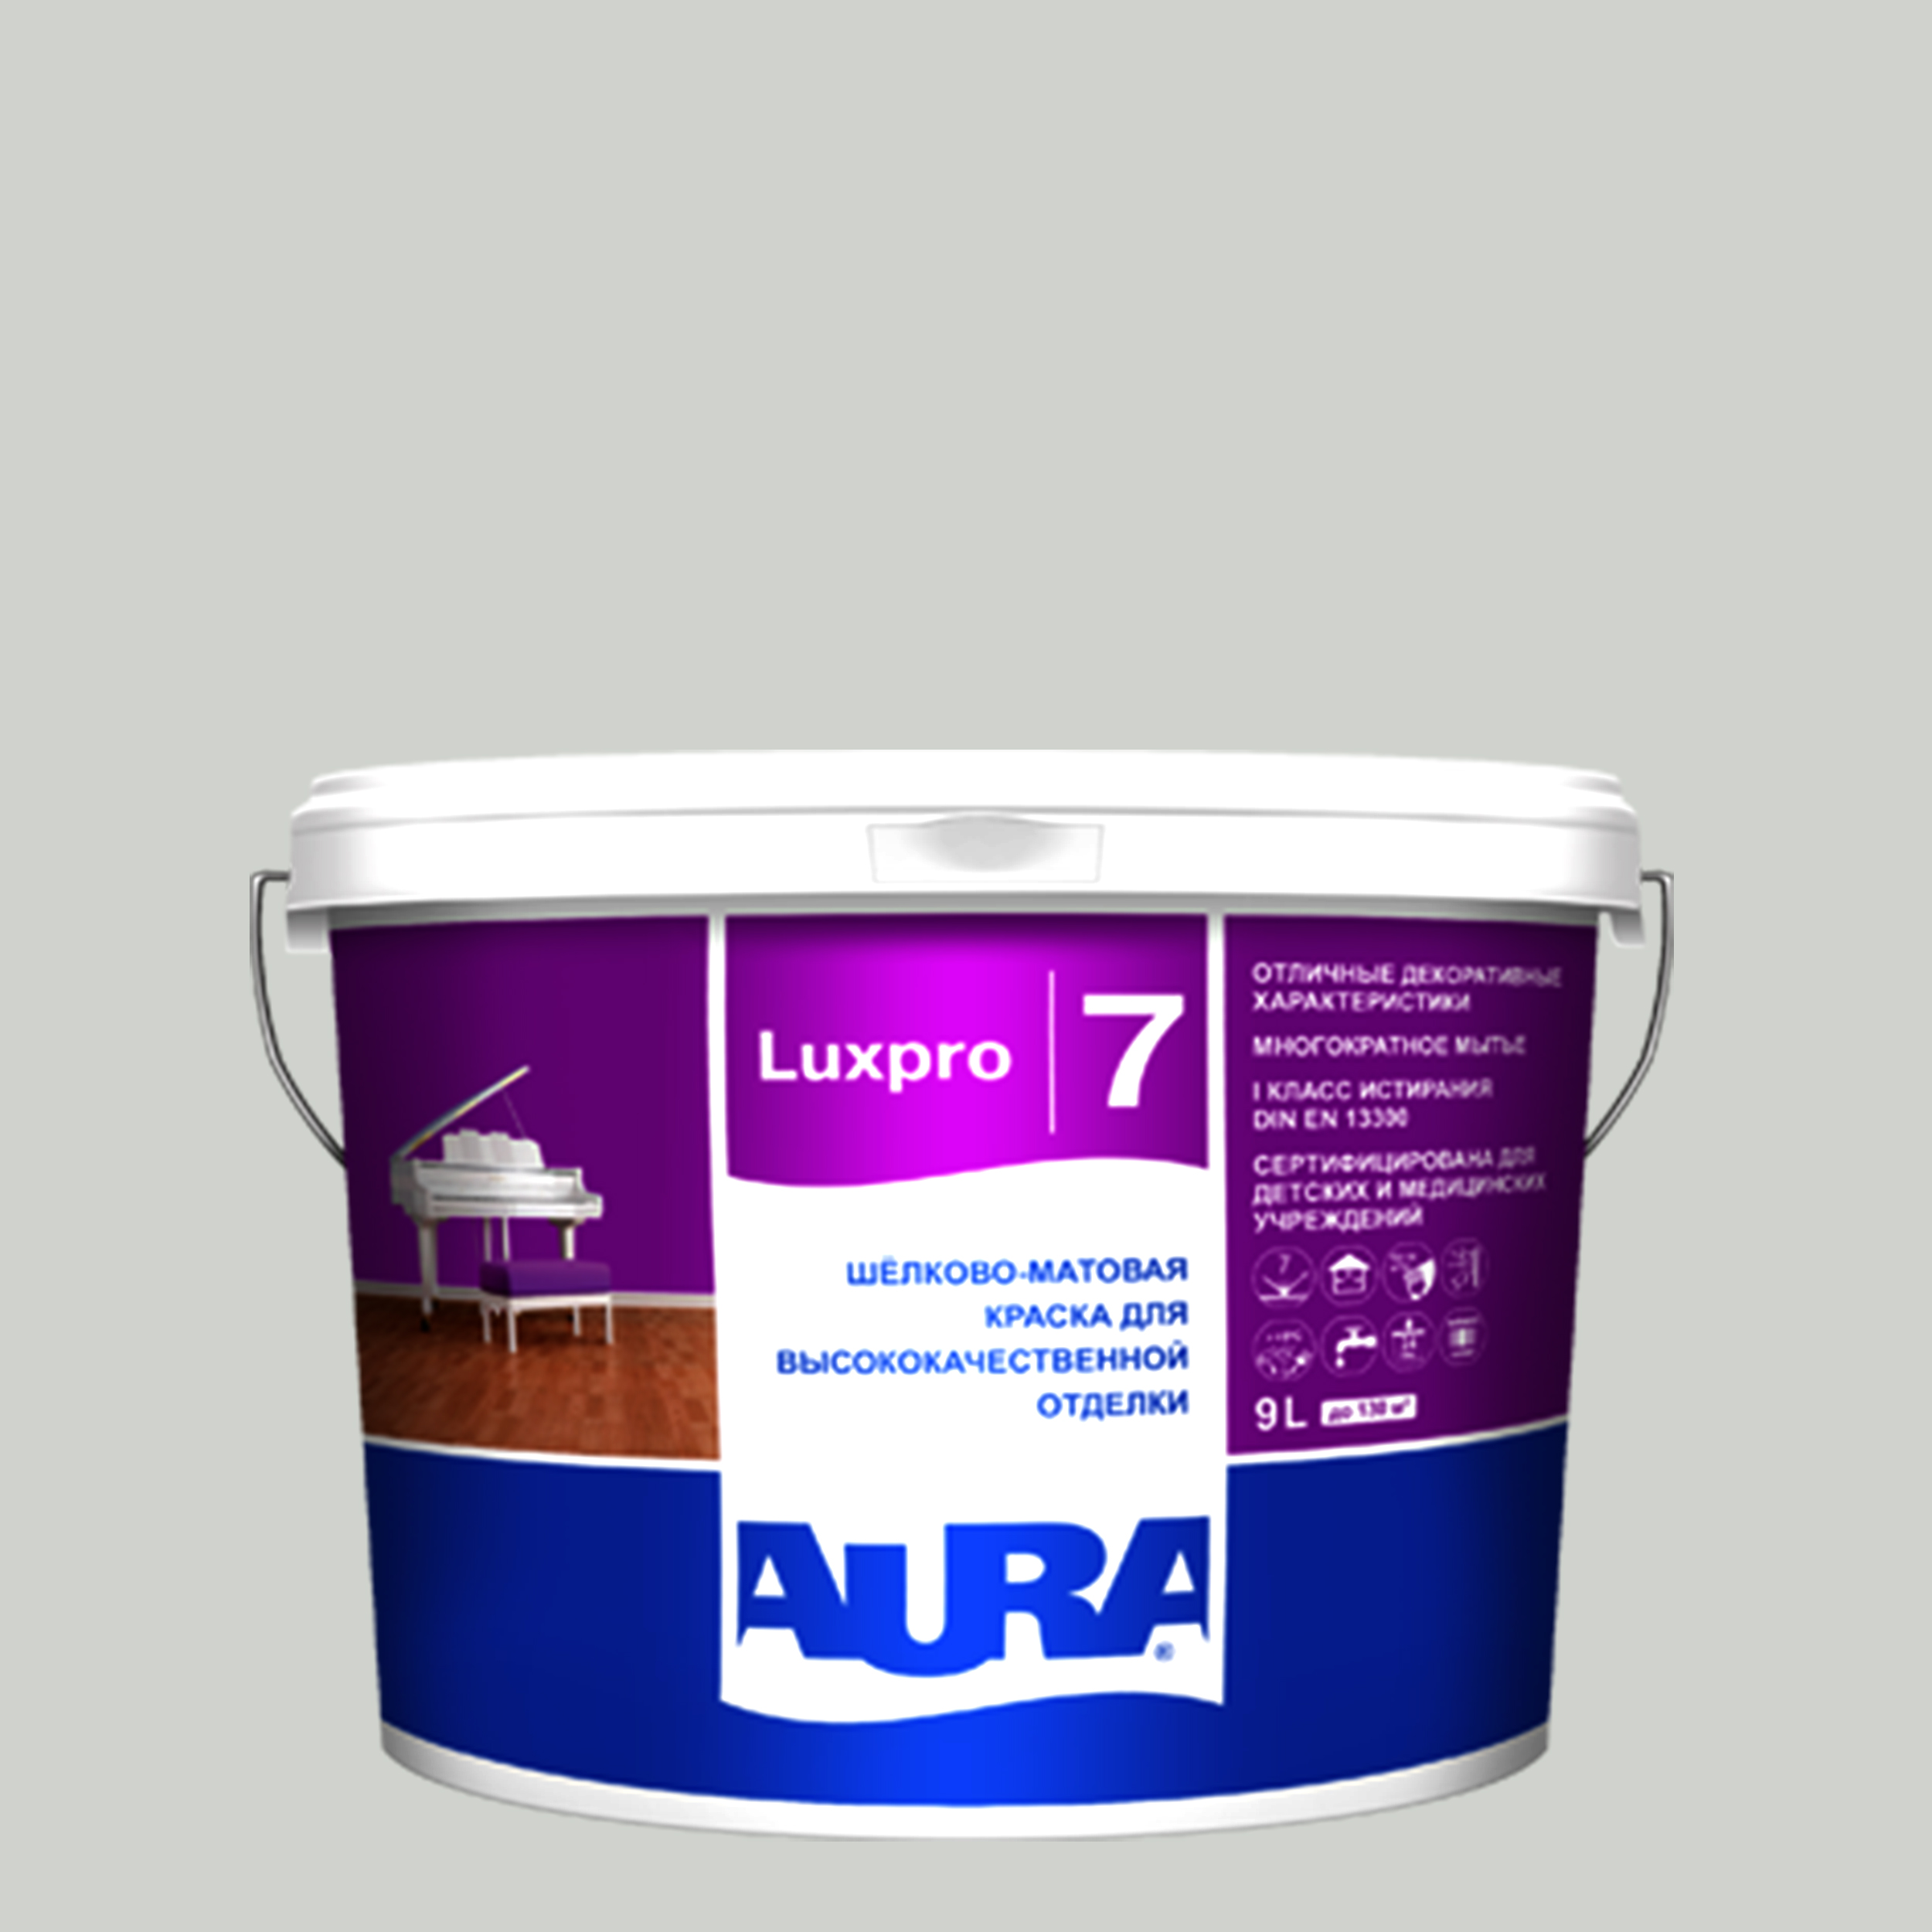 Фото 4 - Краска интерьерная, Aura LuxPRO 7, RAL 5013, 11 кг.